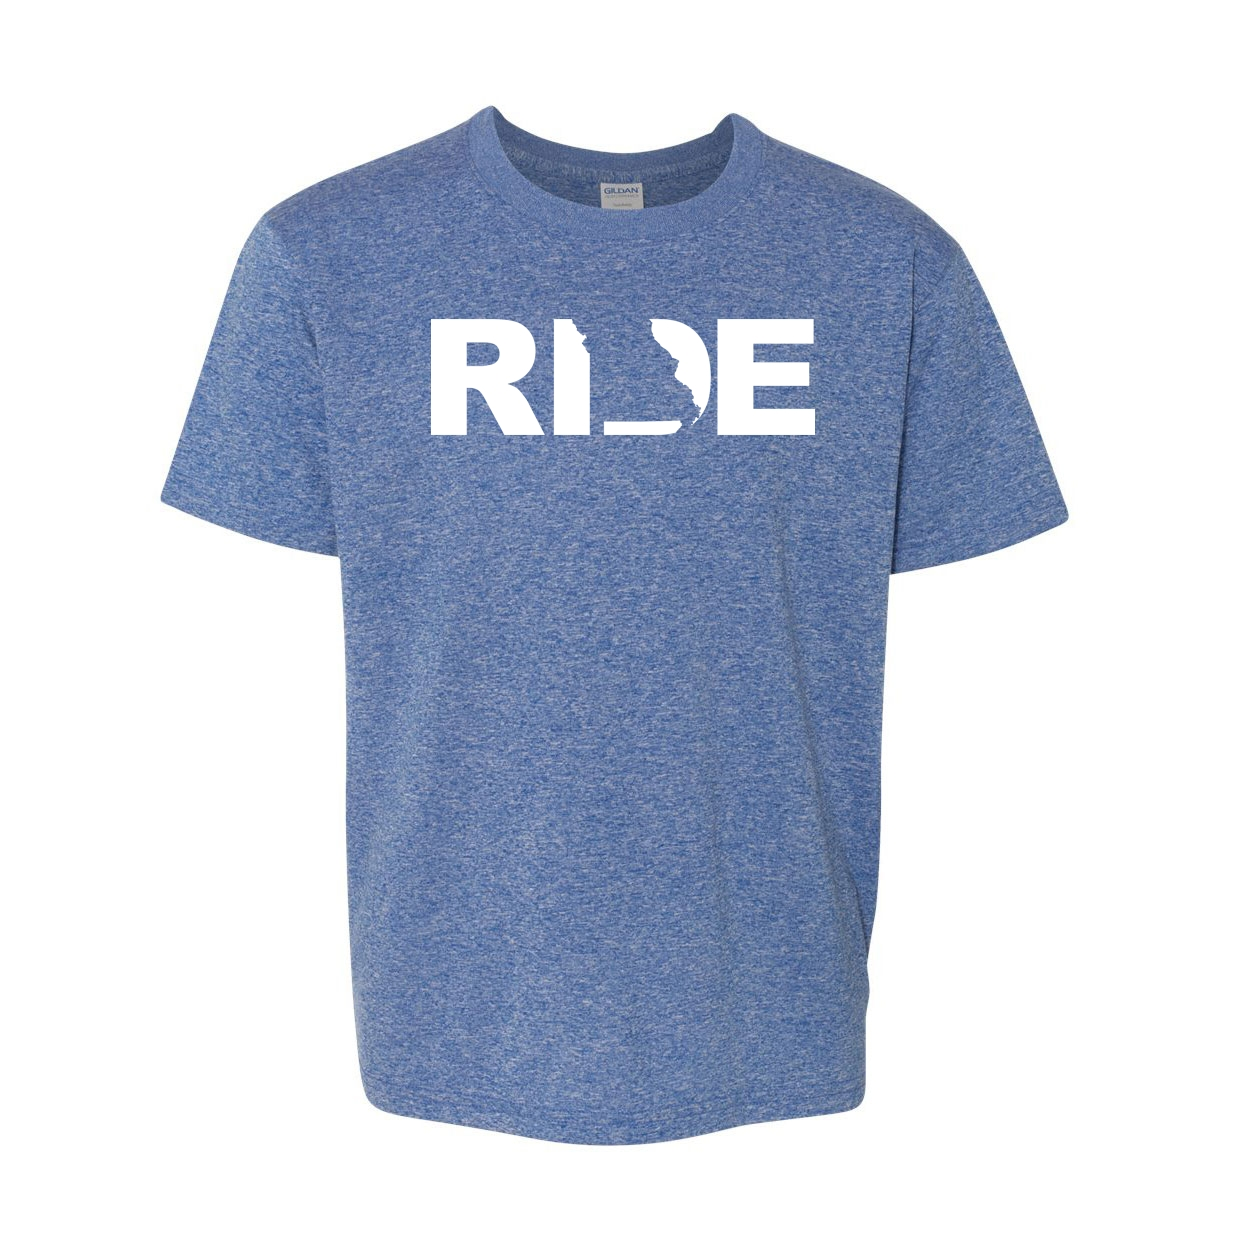 Ride Missouri Classic Youth T-Shirt Blue (White Logo)